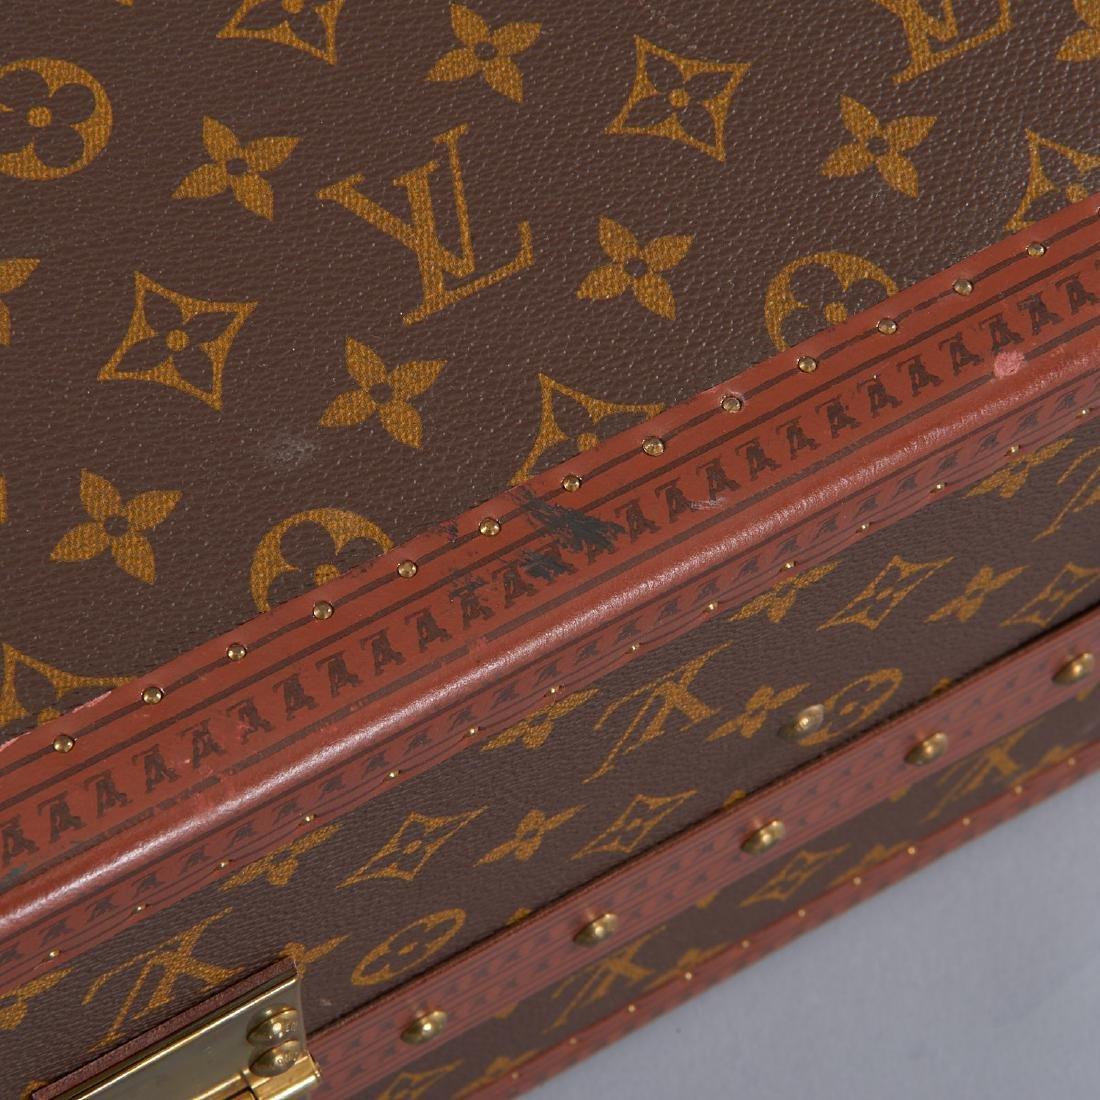 Louis Vuitton Monogram hard sided shoe trunk - 5